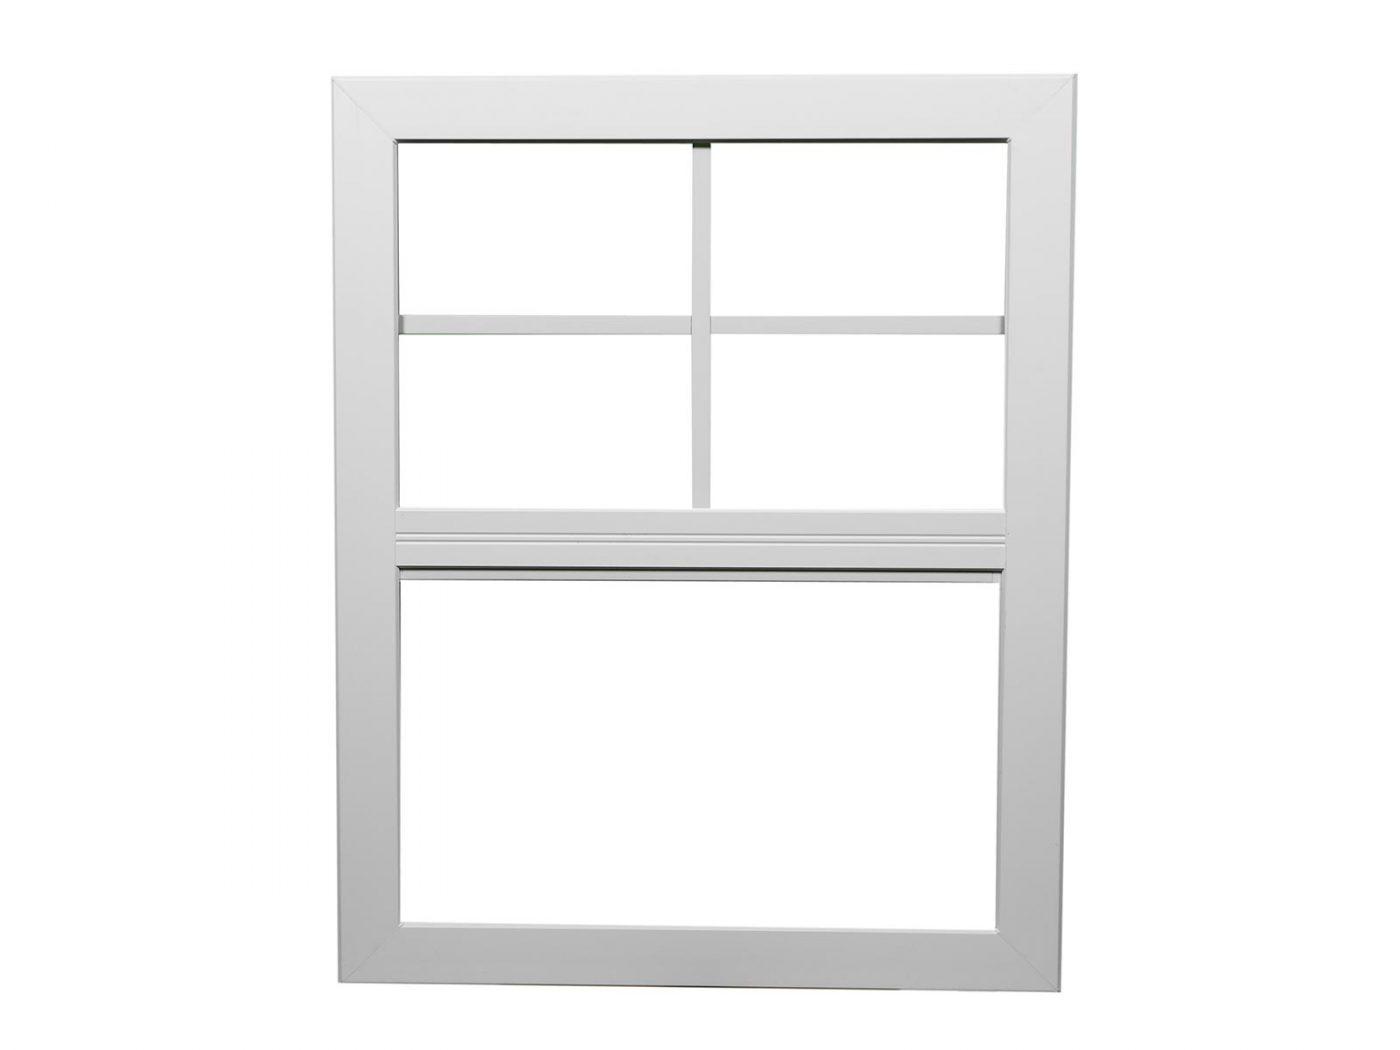 Signature series single hung window installation seattle